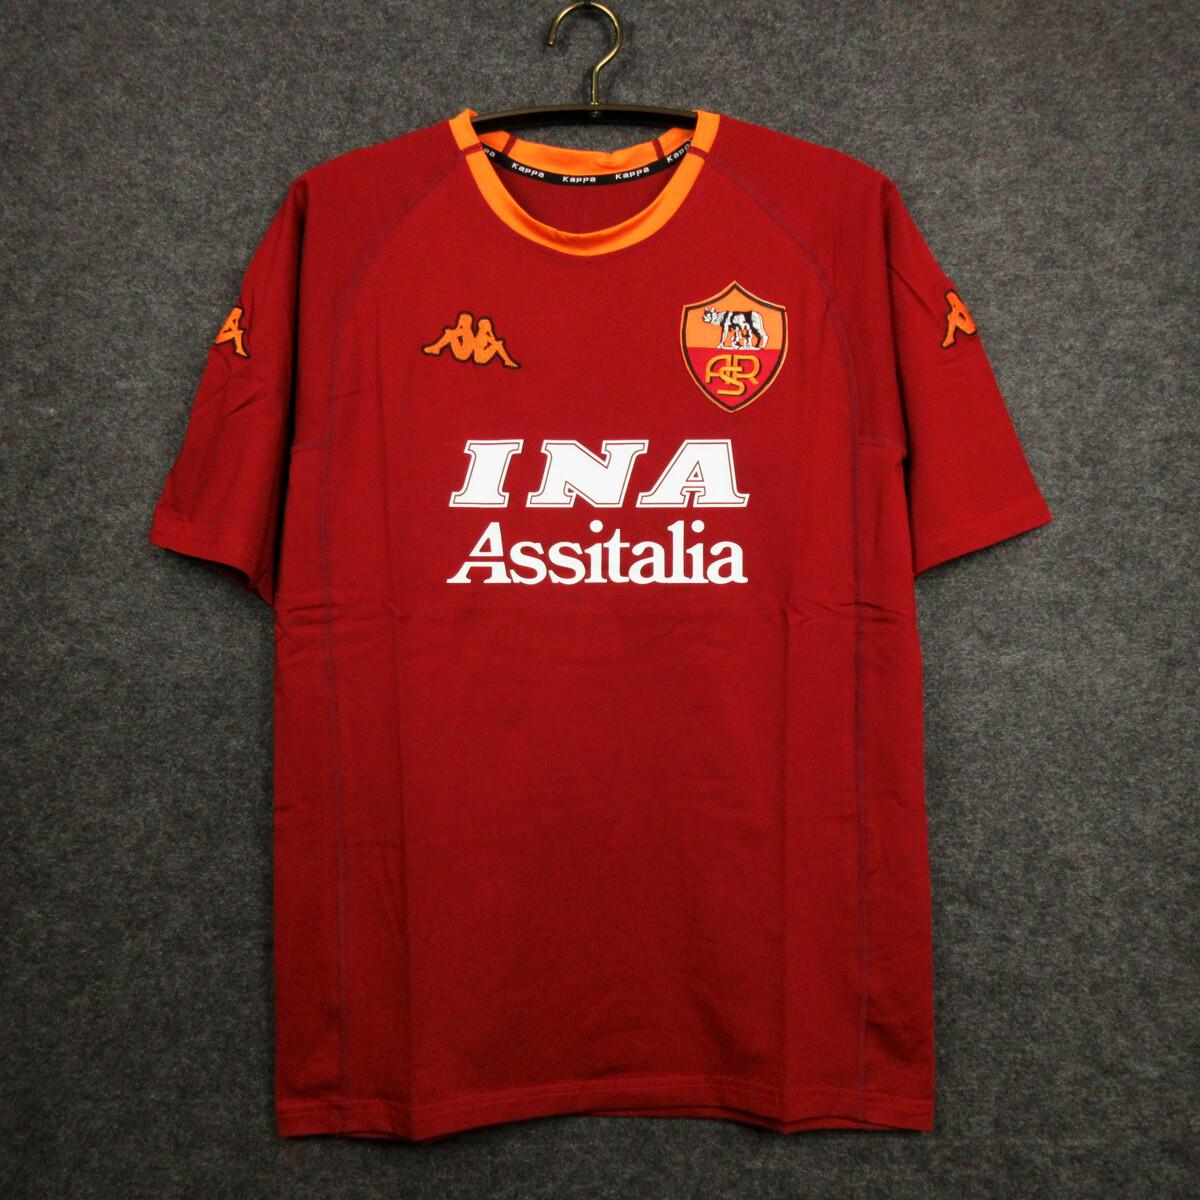 Camisa Roma 2000-2001 Home-Uniforme 1